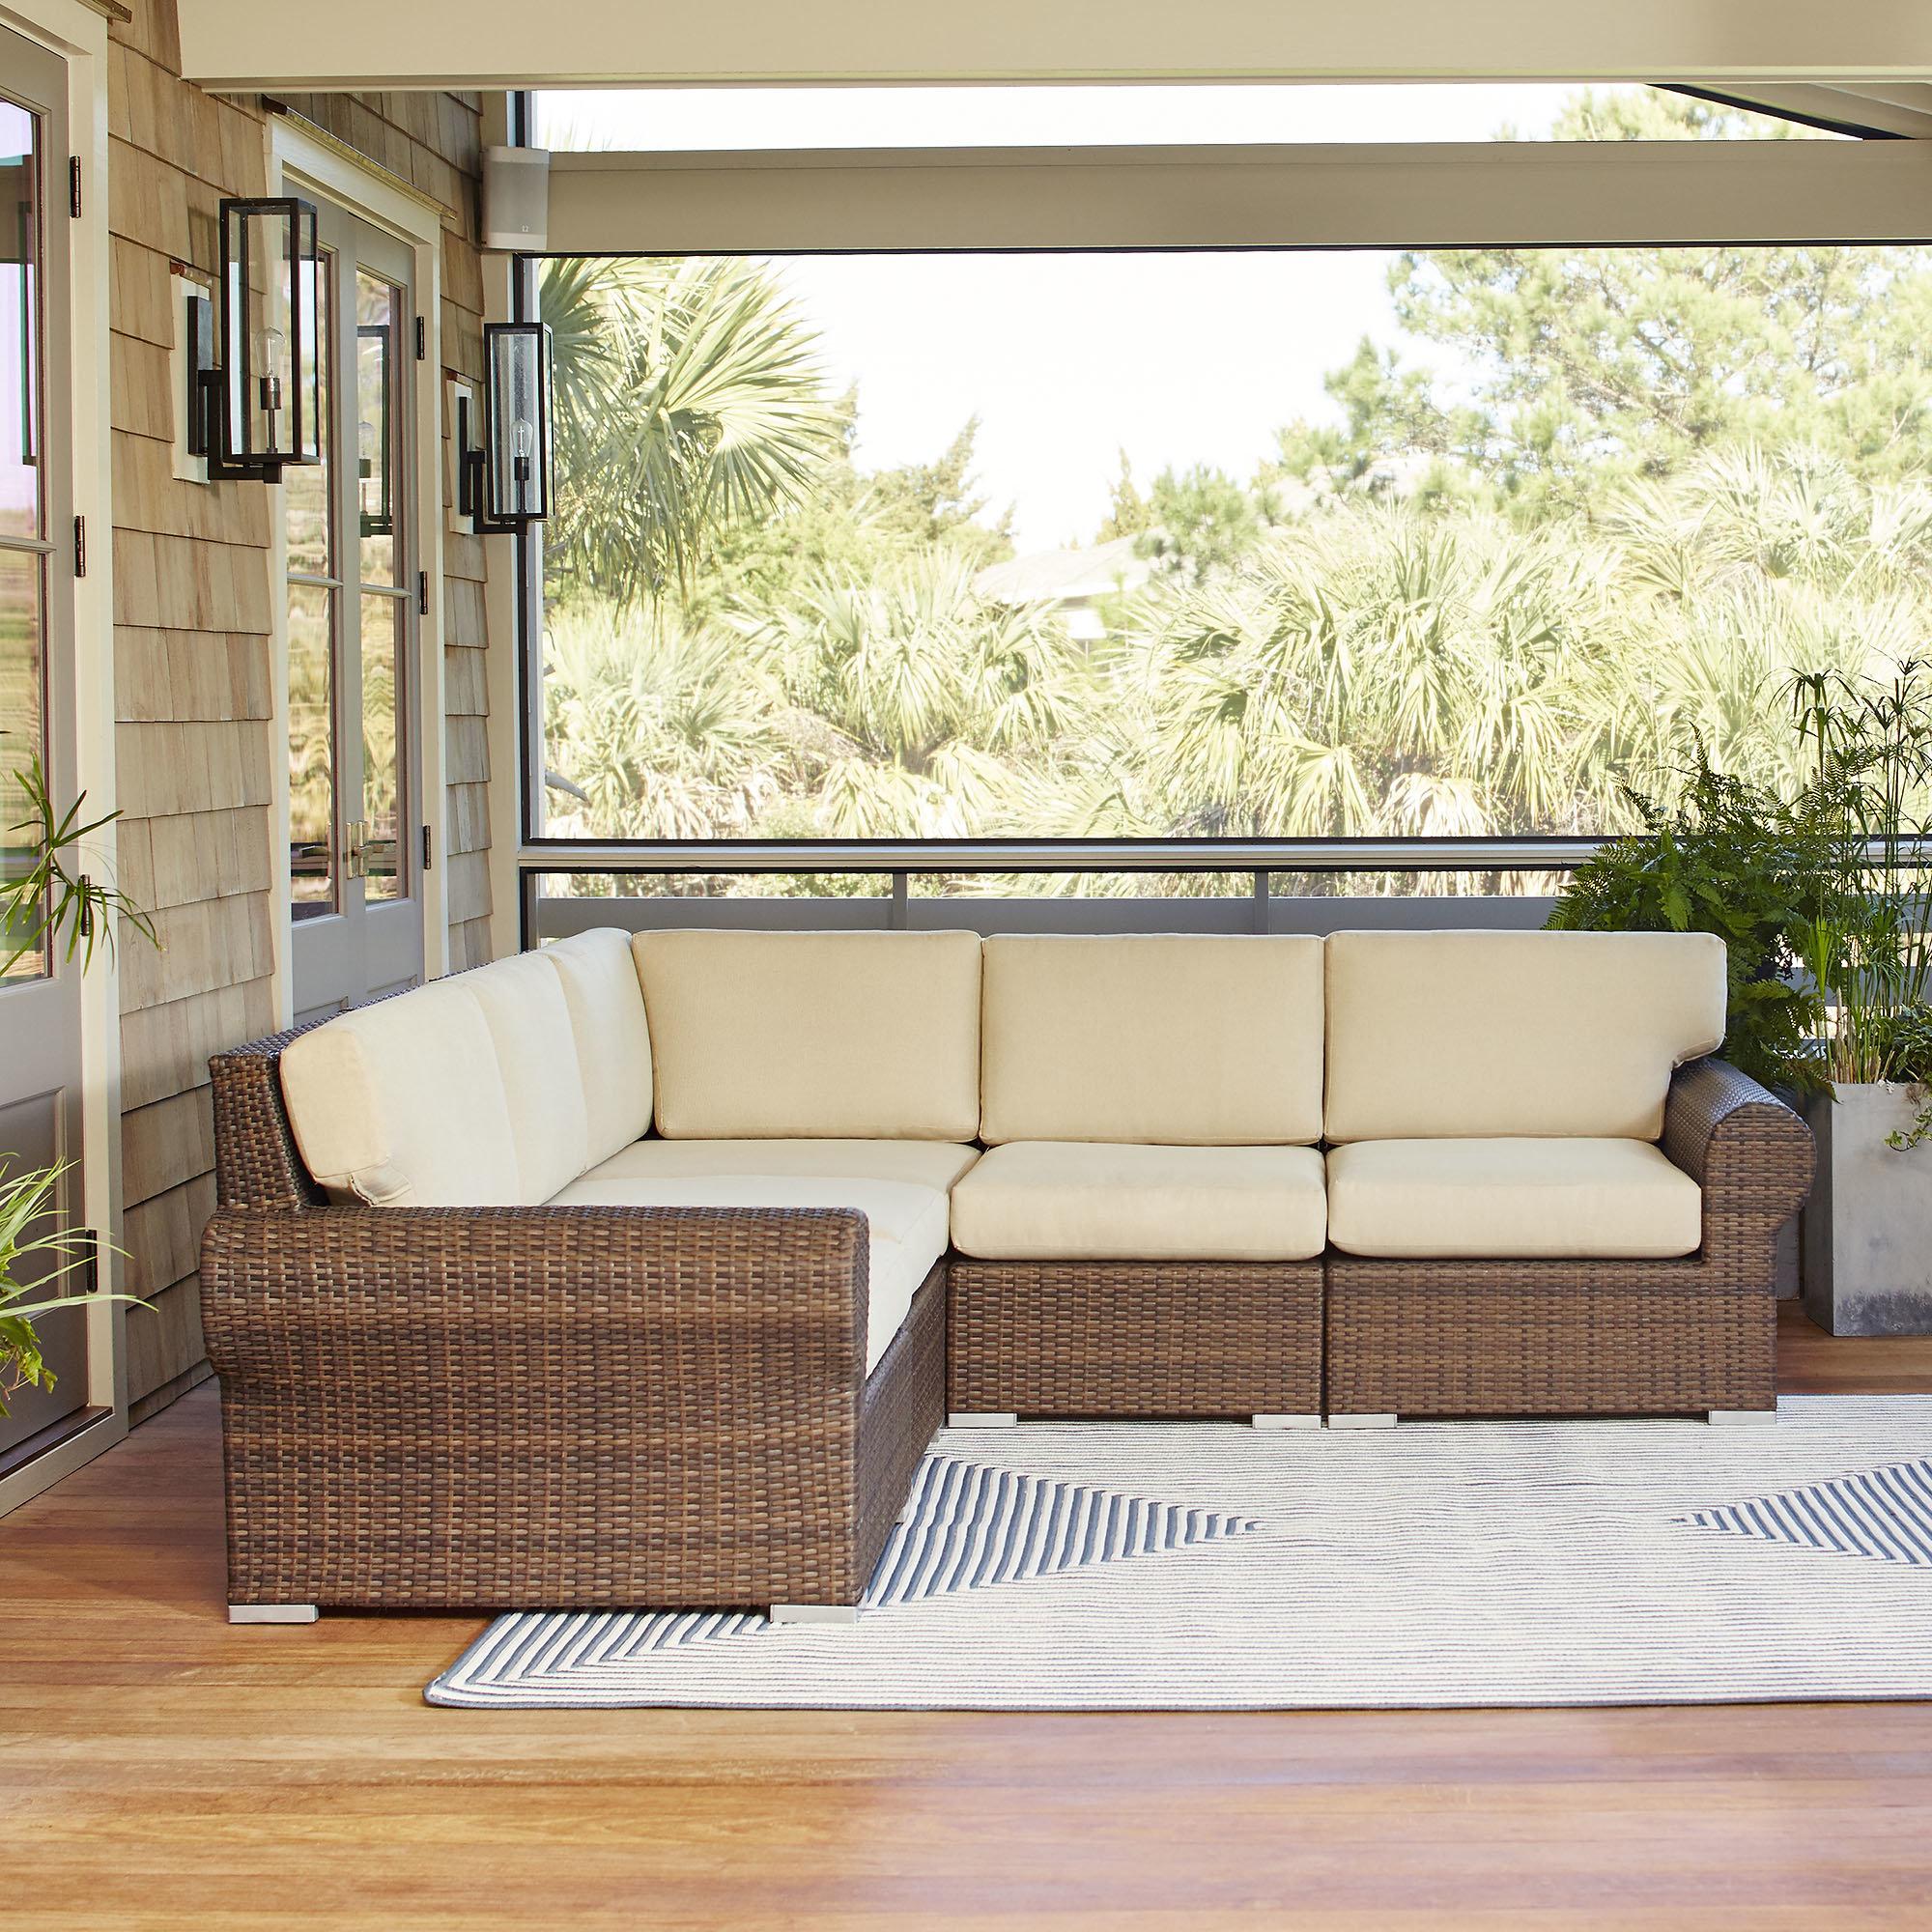 birch lane™ brookhaven patio sectional with cushions u0026 reviews | birch lane RZOUEKW